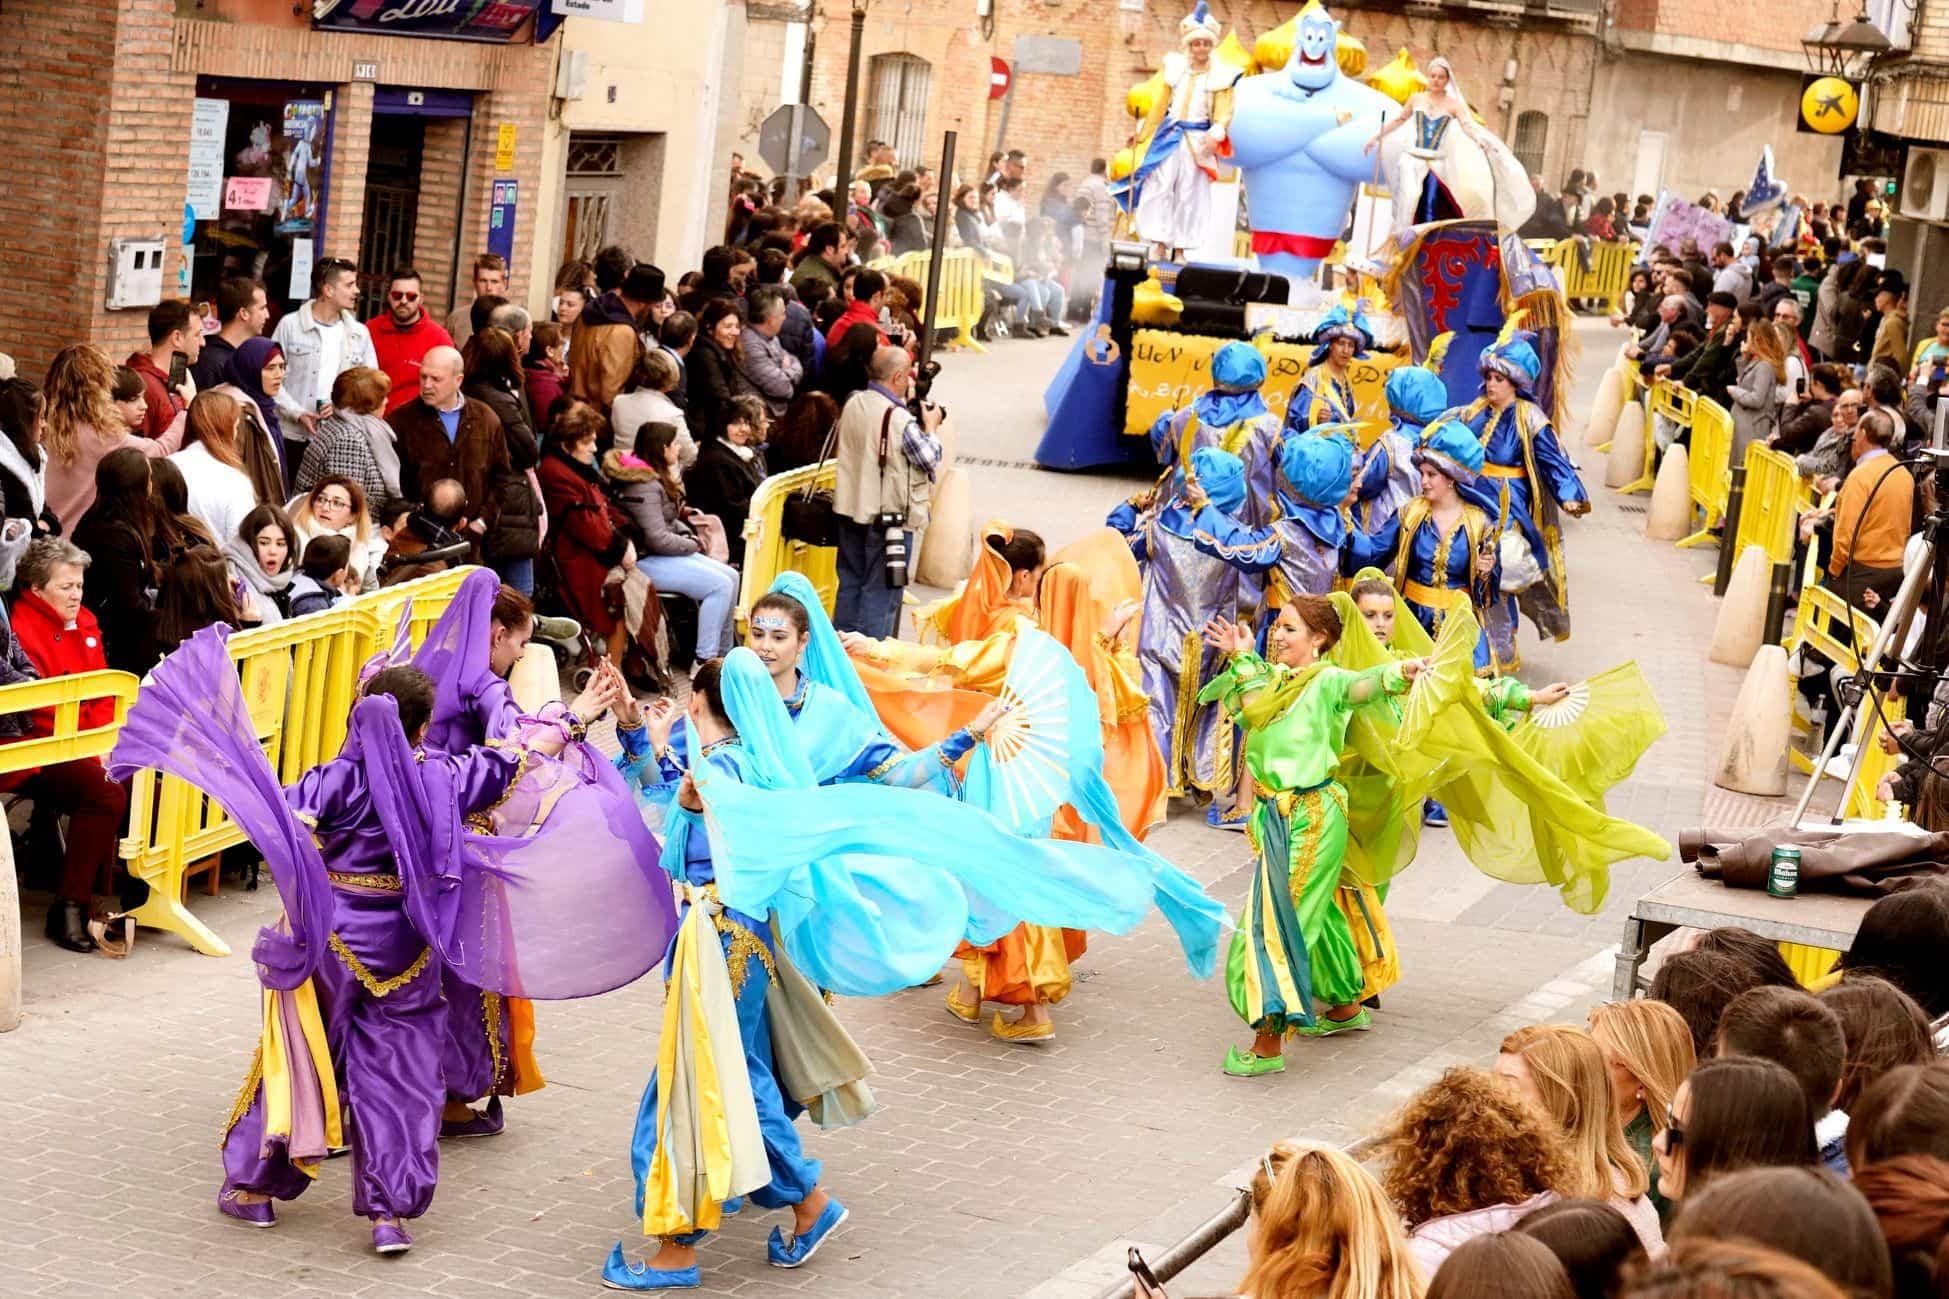 Carnaval de herencia 2020 ofertorio 82 - Selección de fotografías del Ofertorio del Carnaval de Herencia